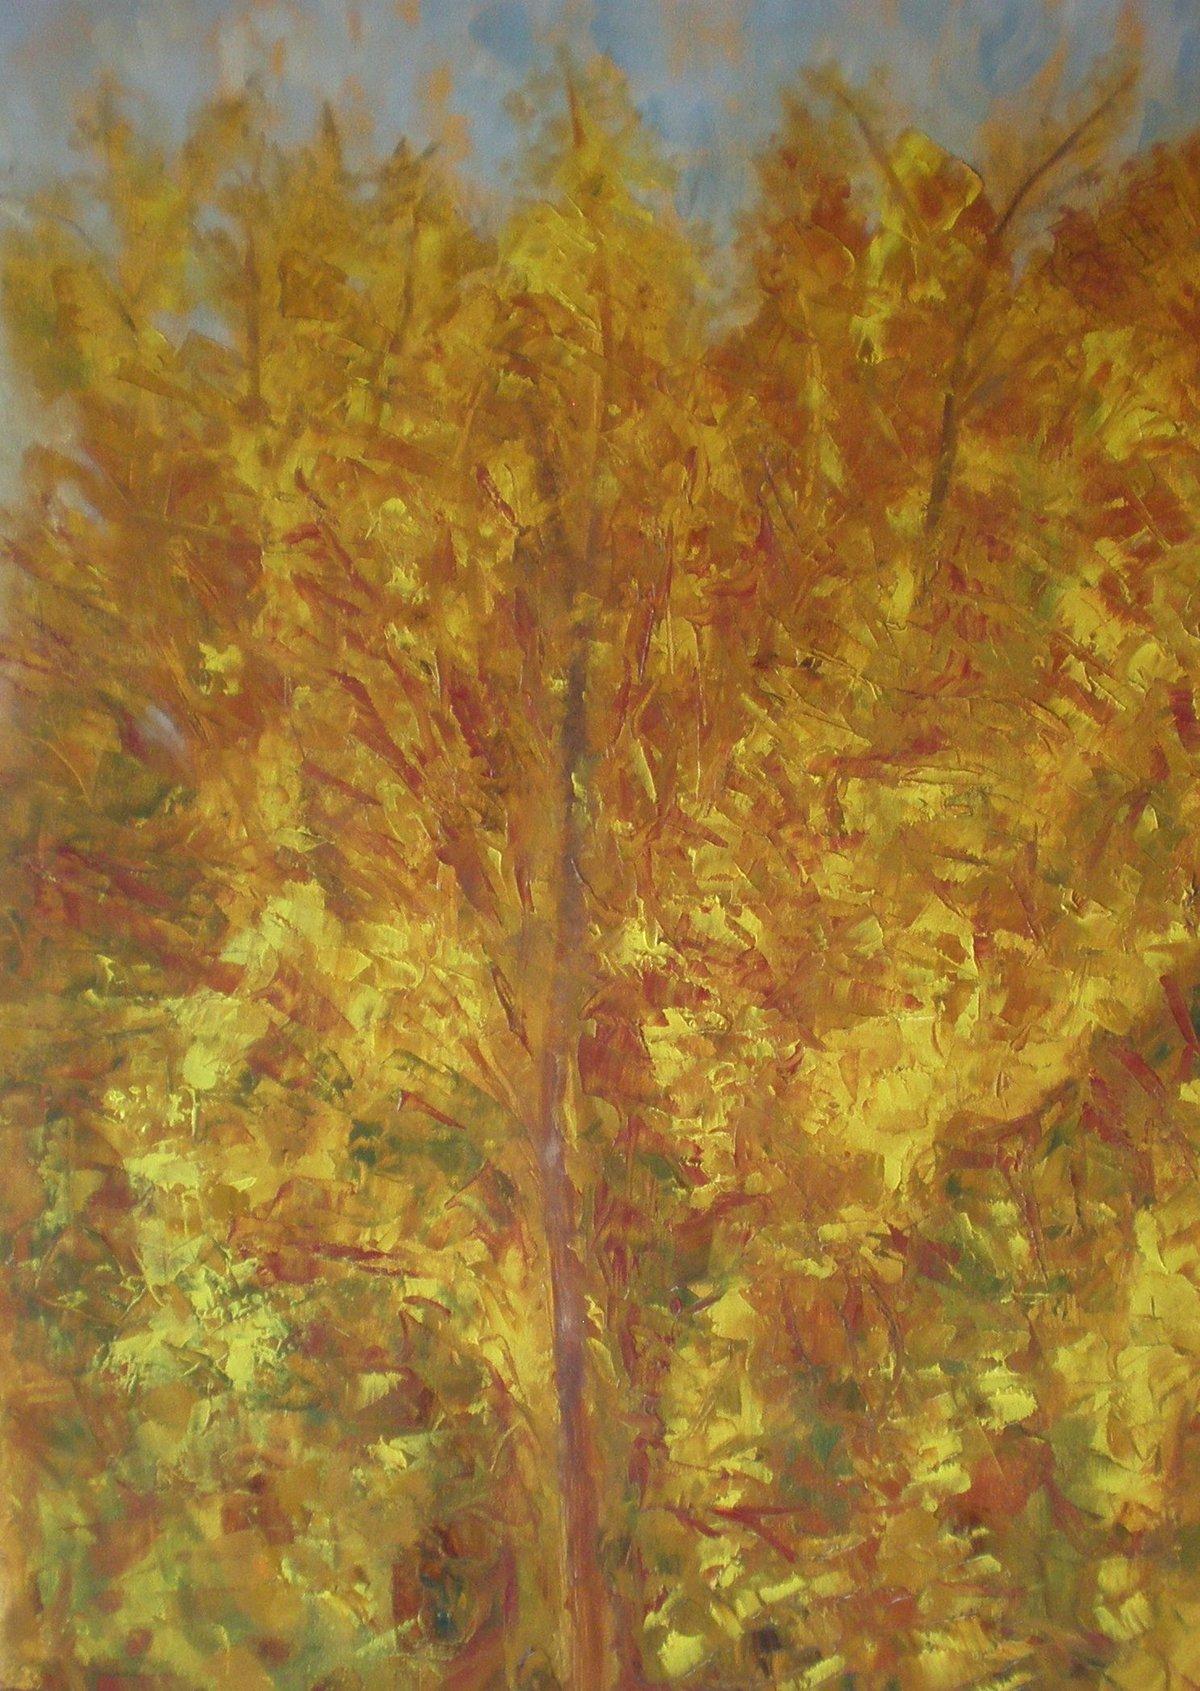 Autumnal 3 close